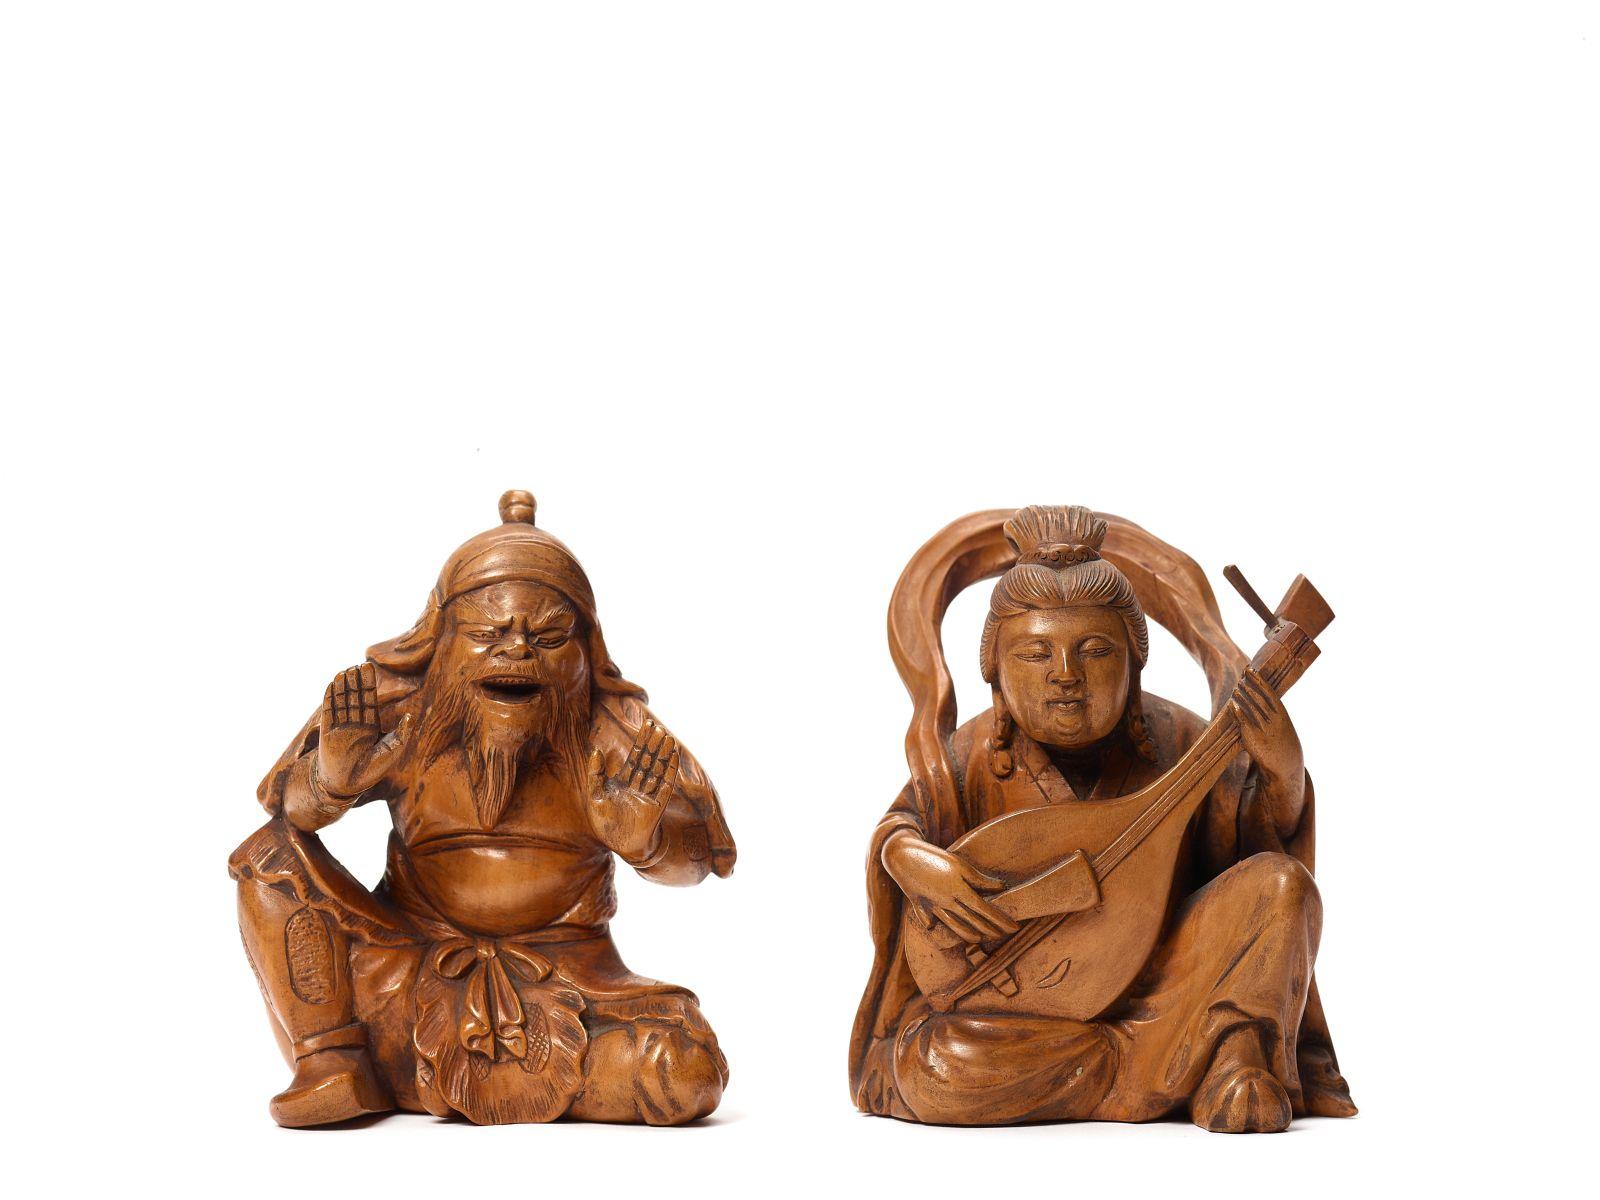 #197 Two wood Okimonos depicting Benten and Bishamon | Zwei Holz-Okimonos mit Benten und Bishamon Image